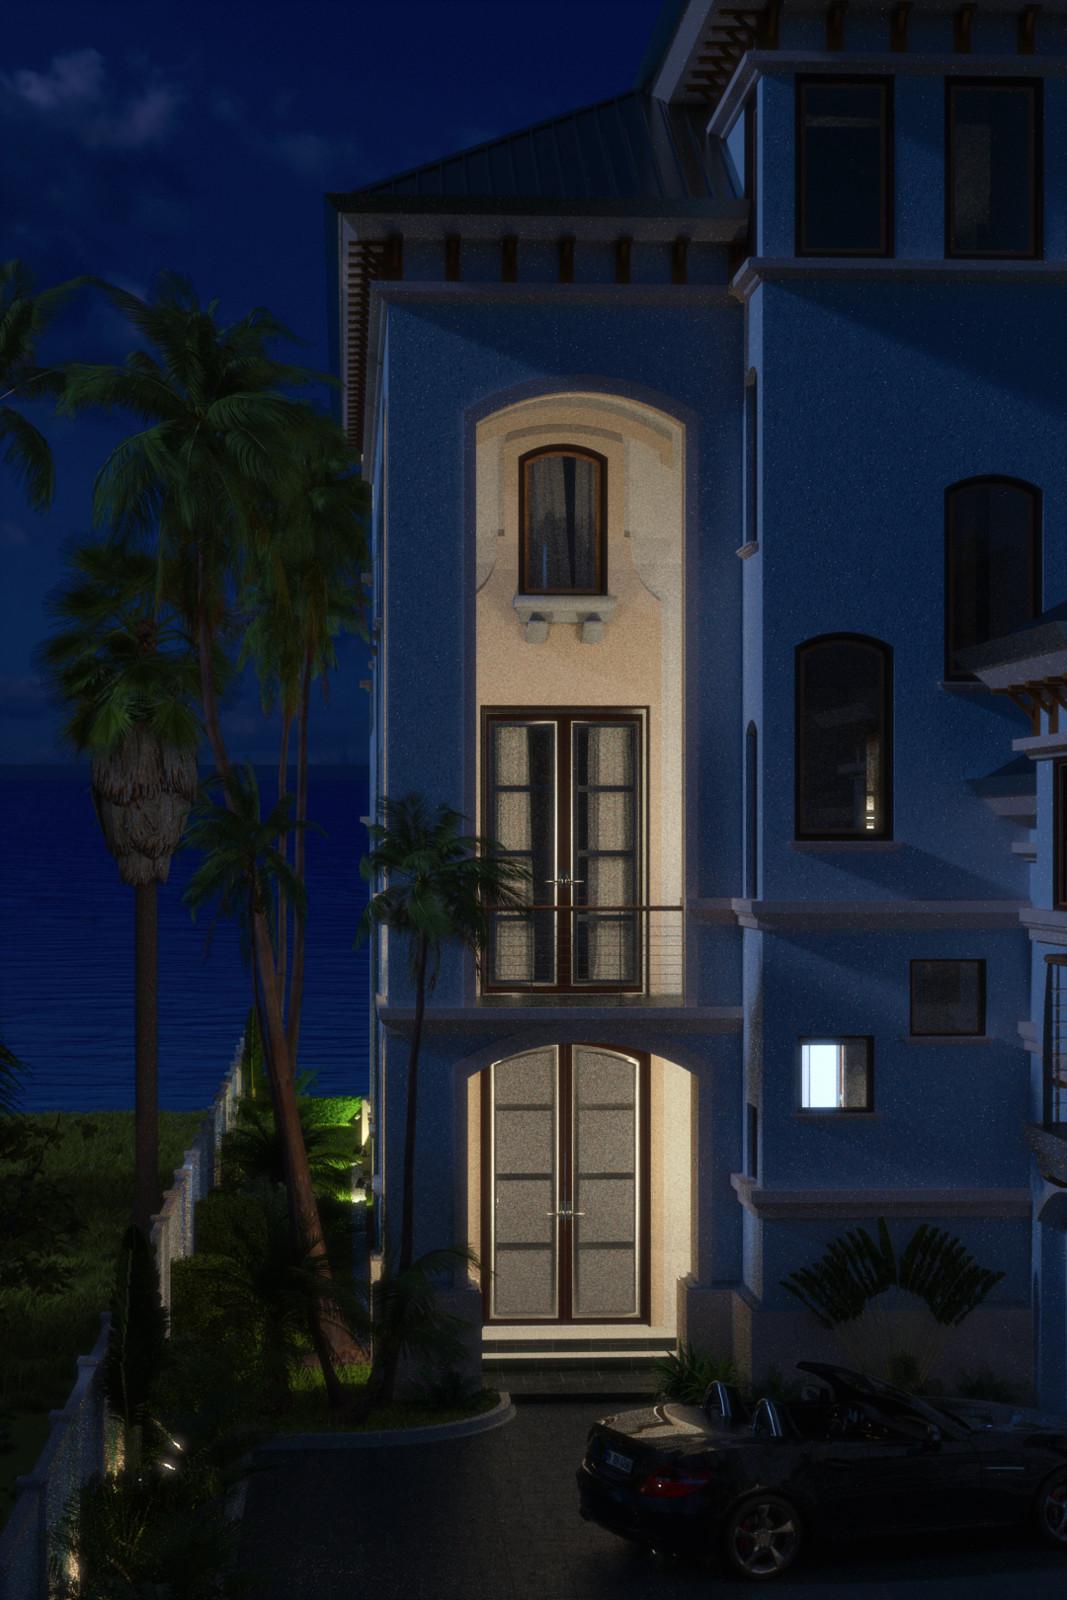 SketchUp + Thea Render  Seagrove Beach House: Front Entrance Vertical 2pt Night B Julia 1080 × 1620 Presto MC Bucket